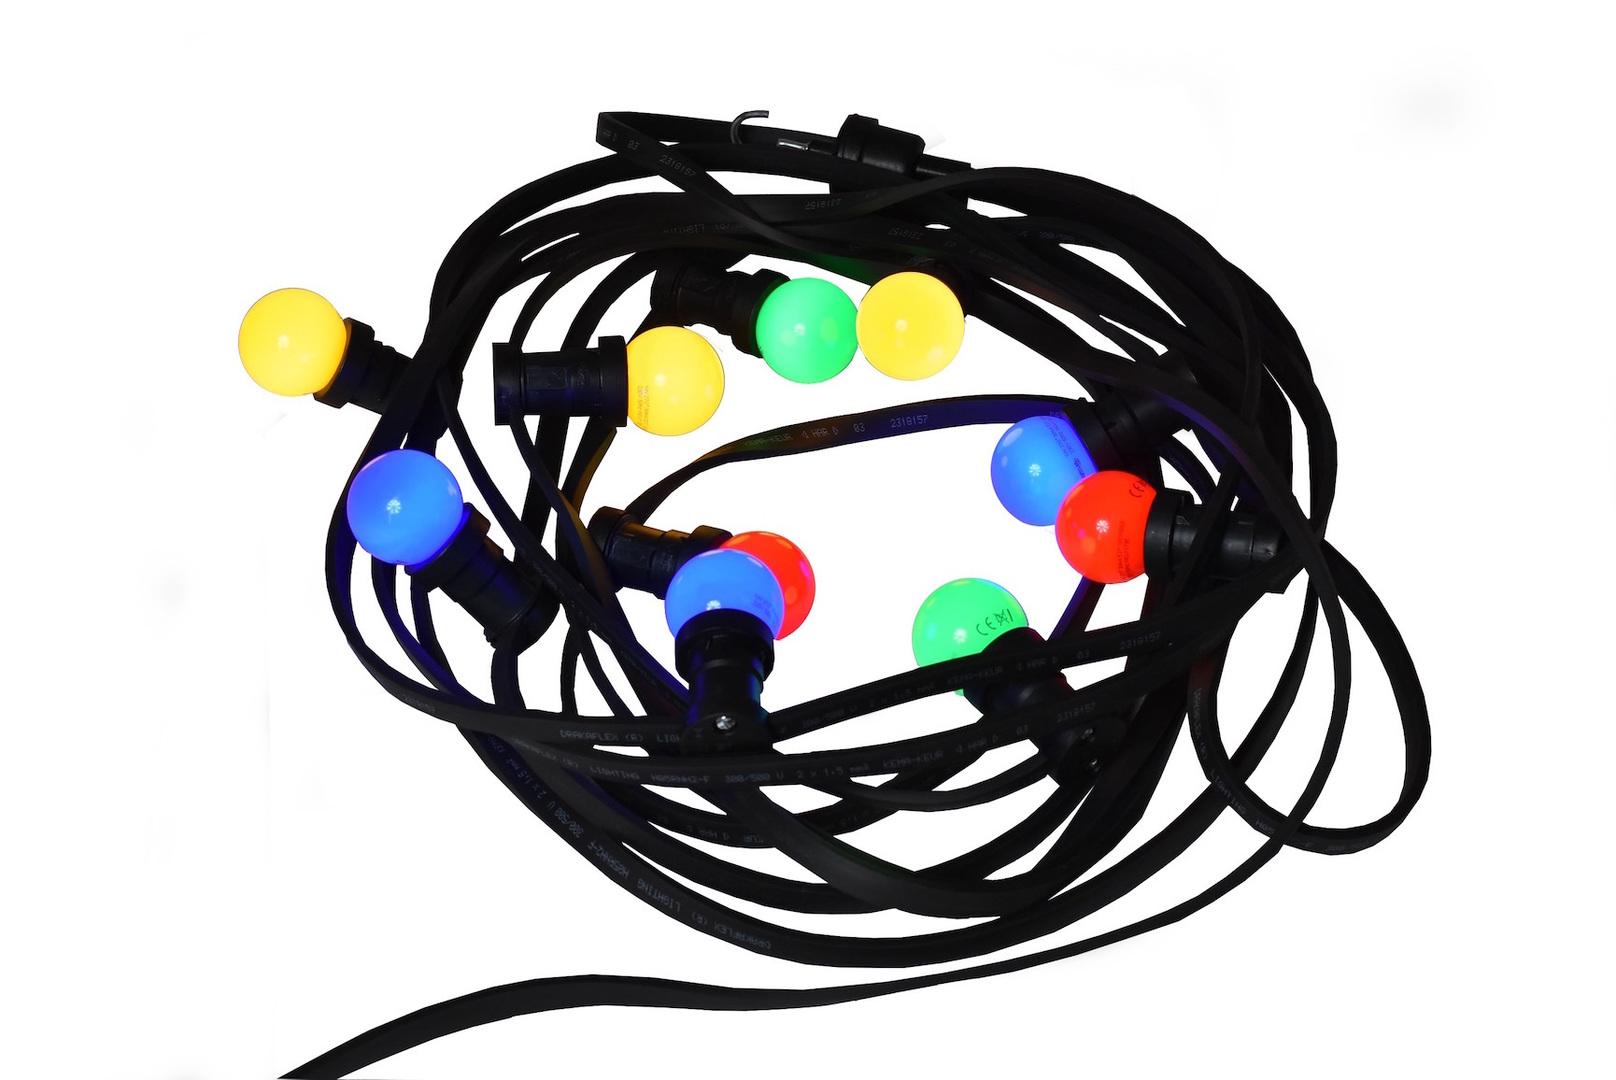 Christmas Tree Light String - 10m with 10 multicolour LED bulbs